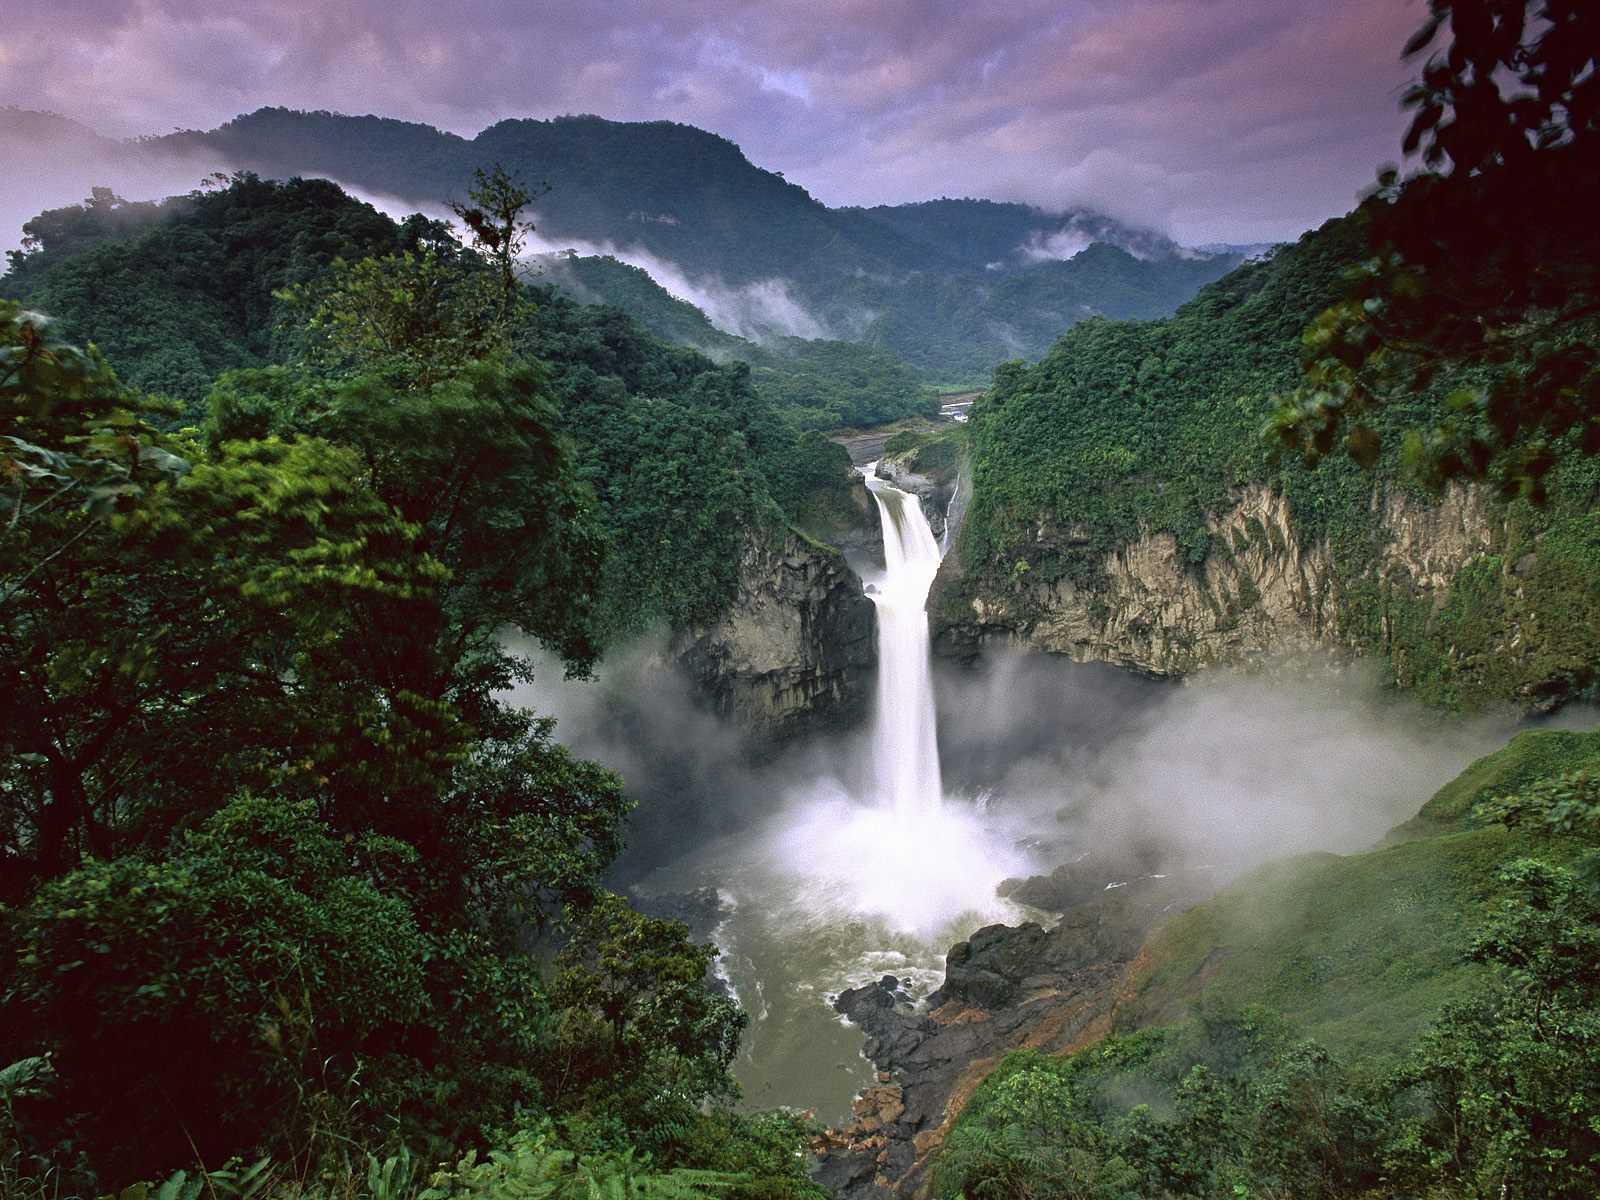 Amazon Rainforests (Amazonia), South America. Mysterious & Amazing places